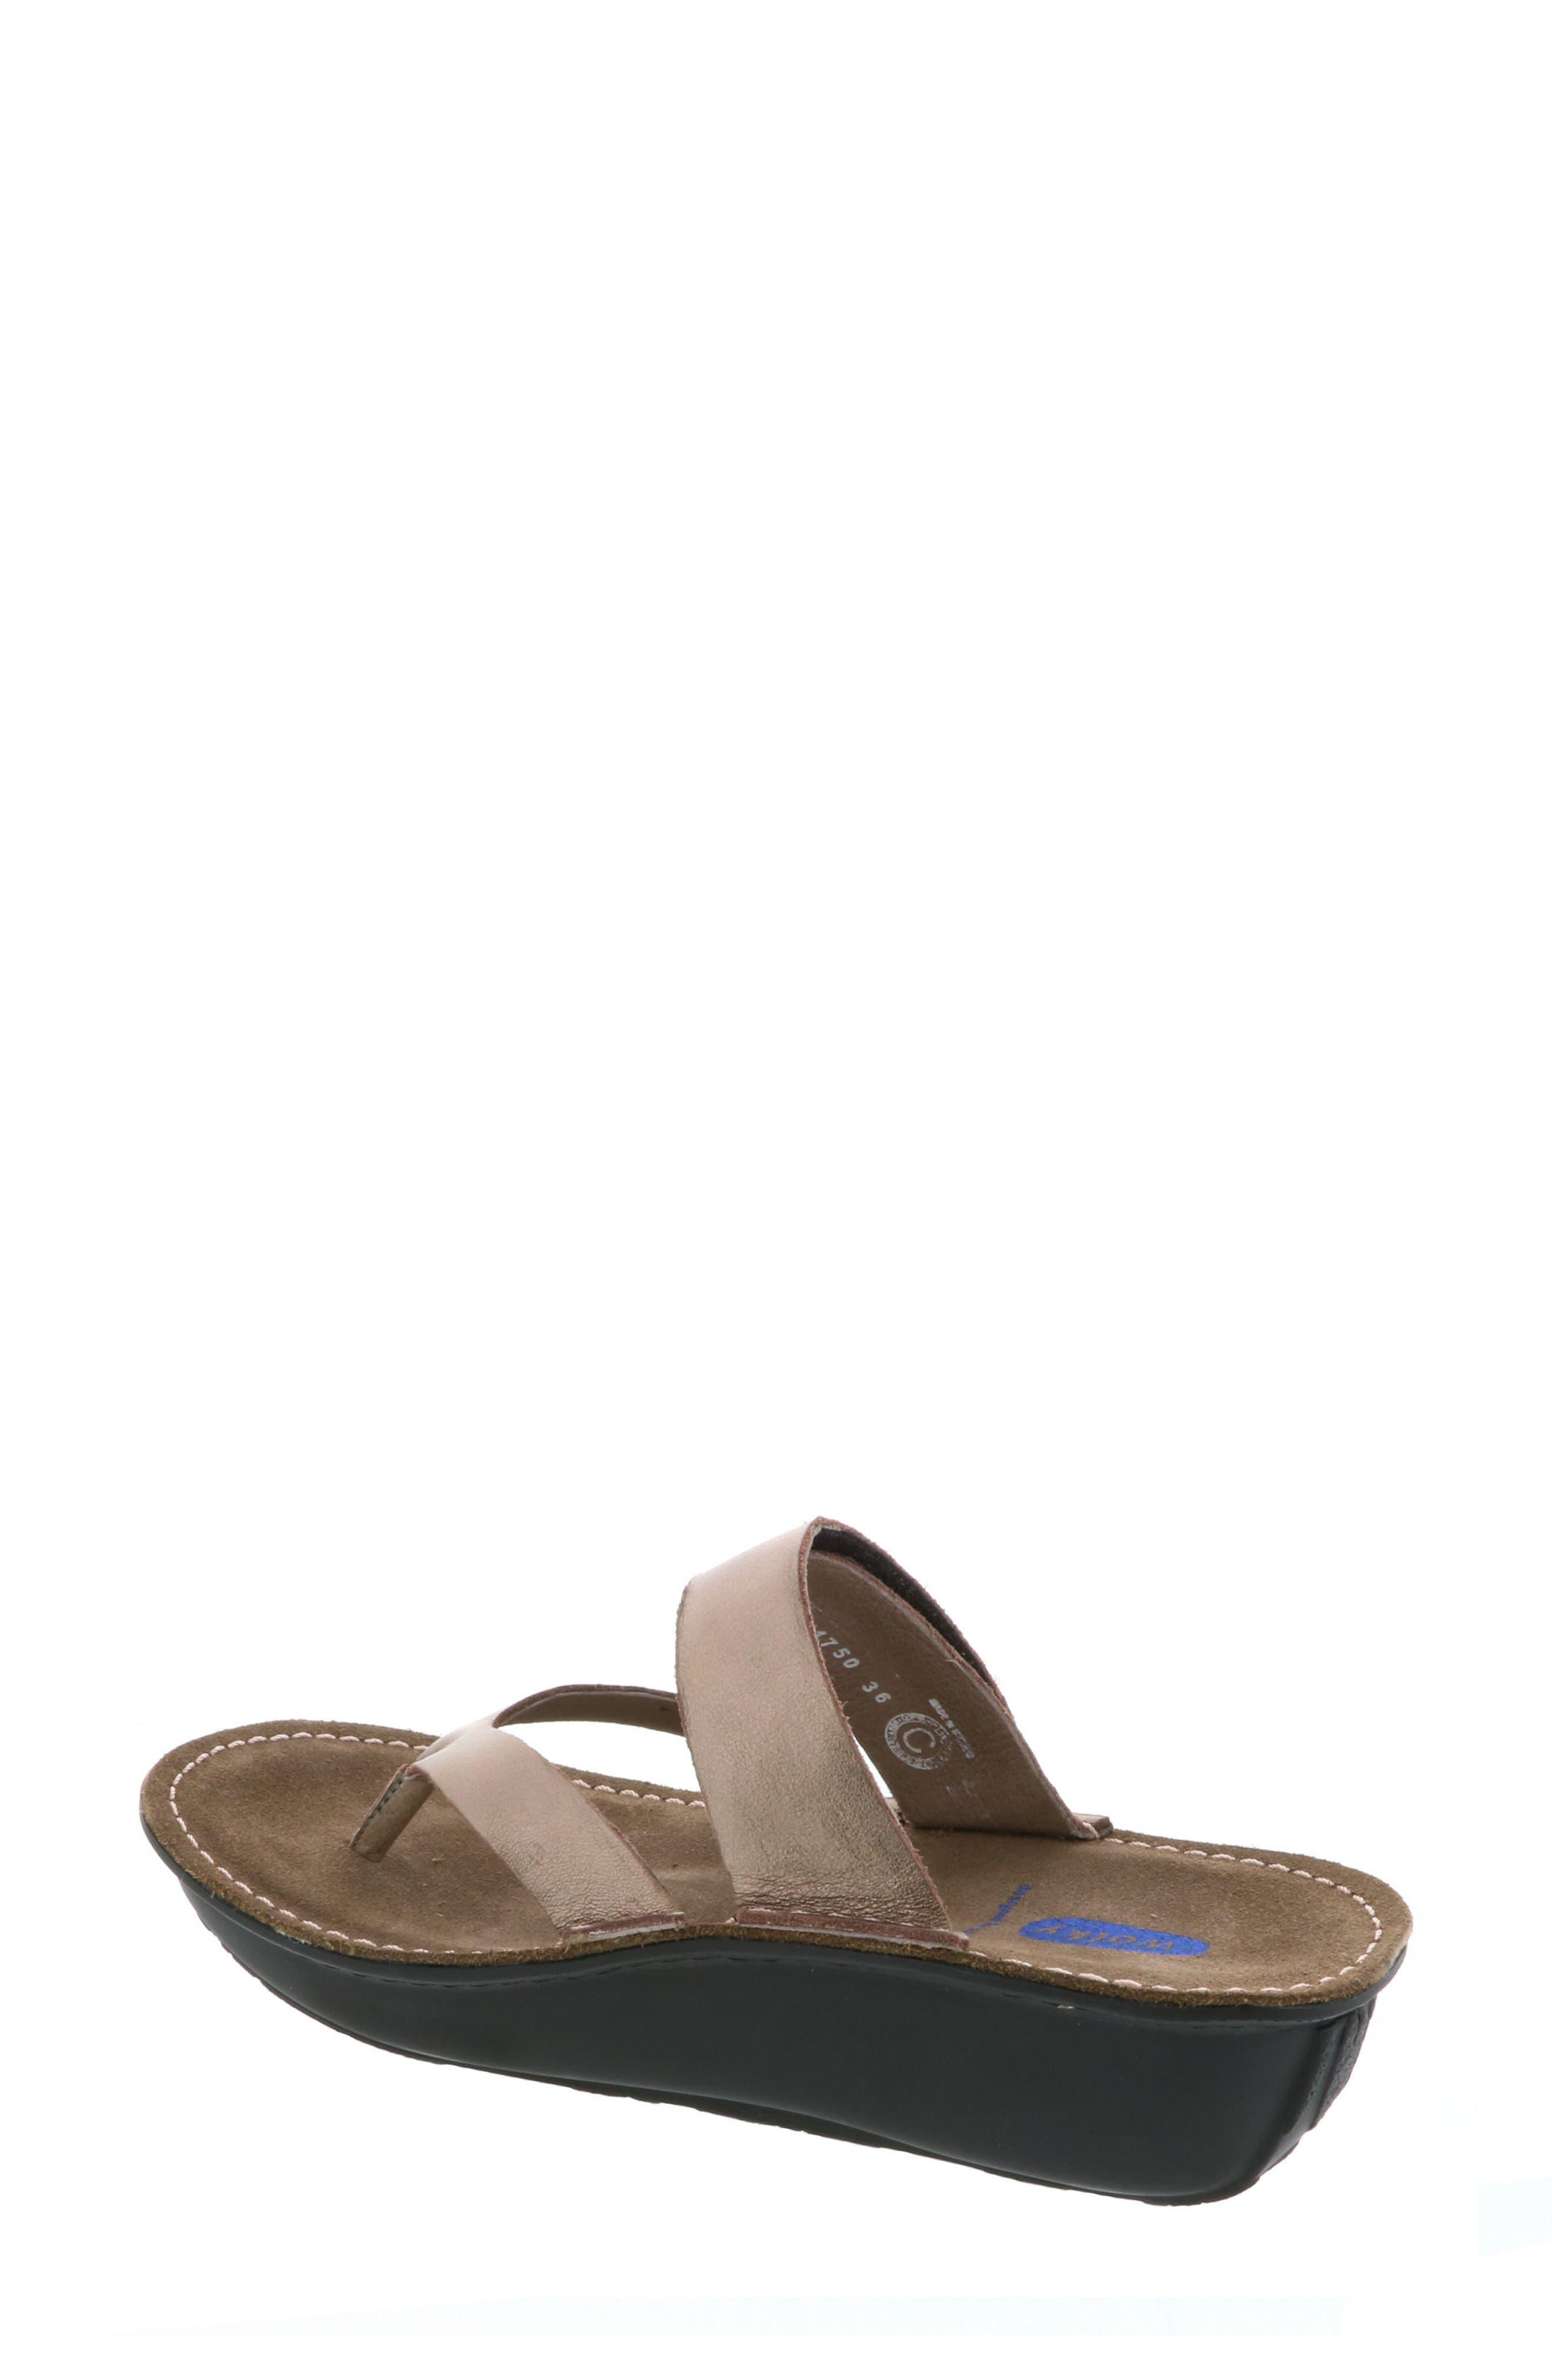 Tahiti Platform Sandal,                             Alternate thumbnail 2, color,                             Bronze Metallic